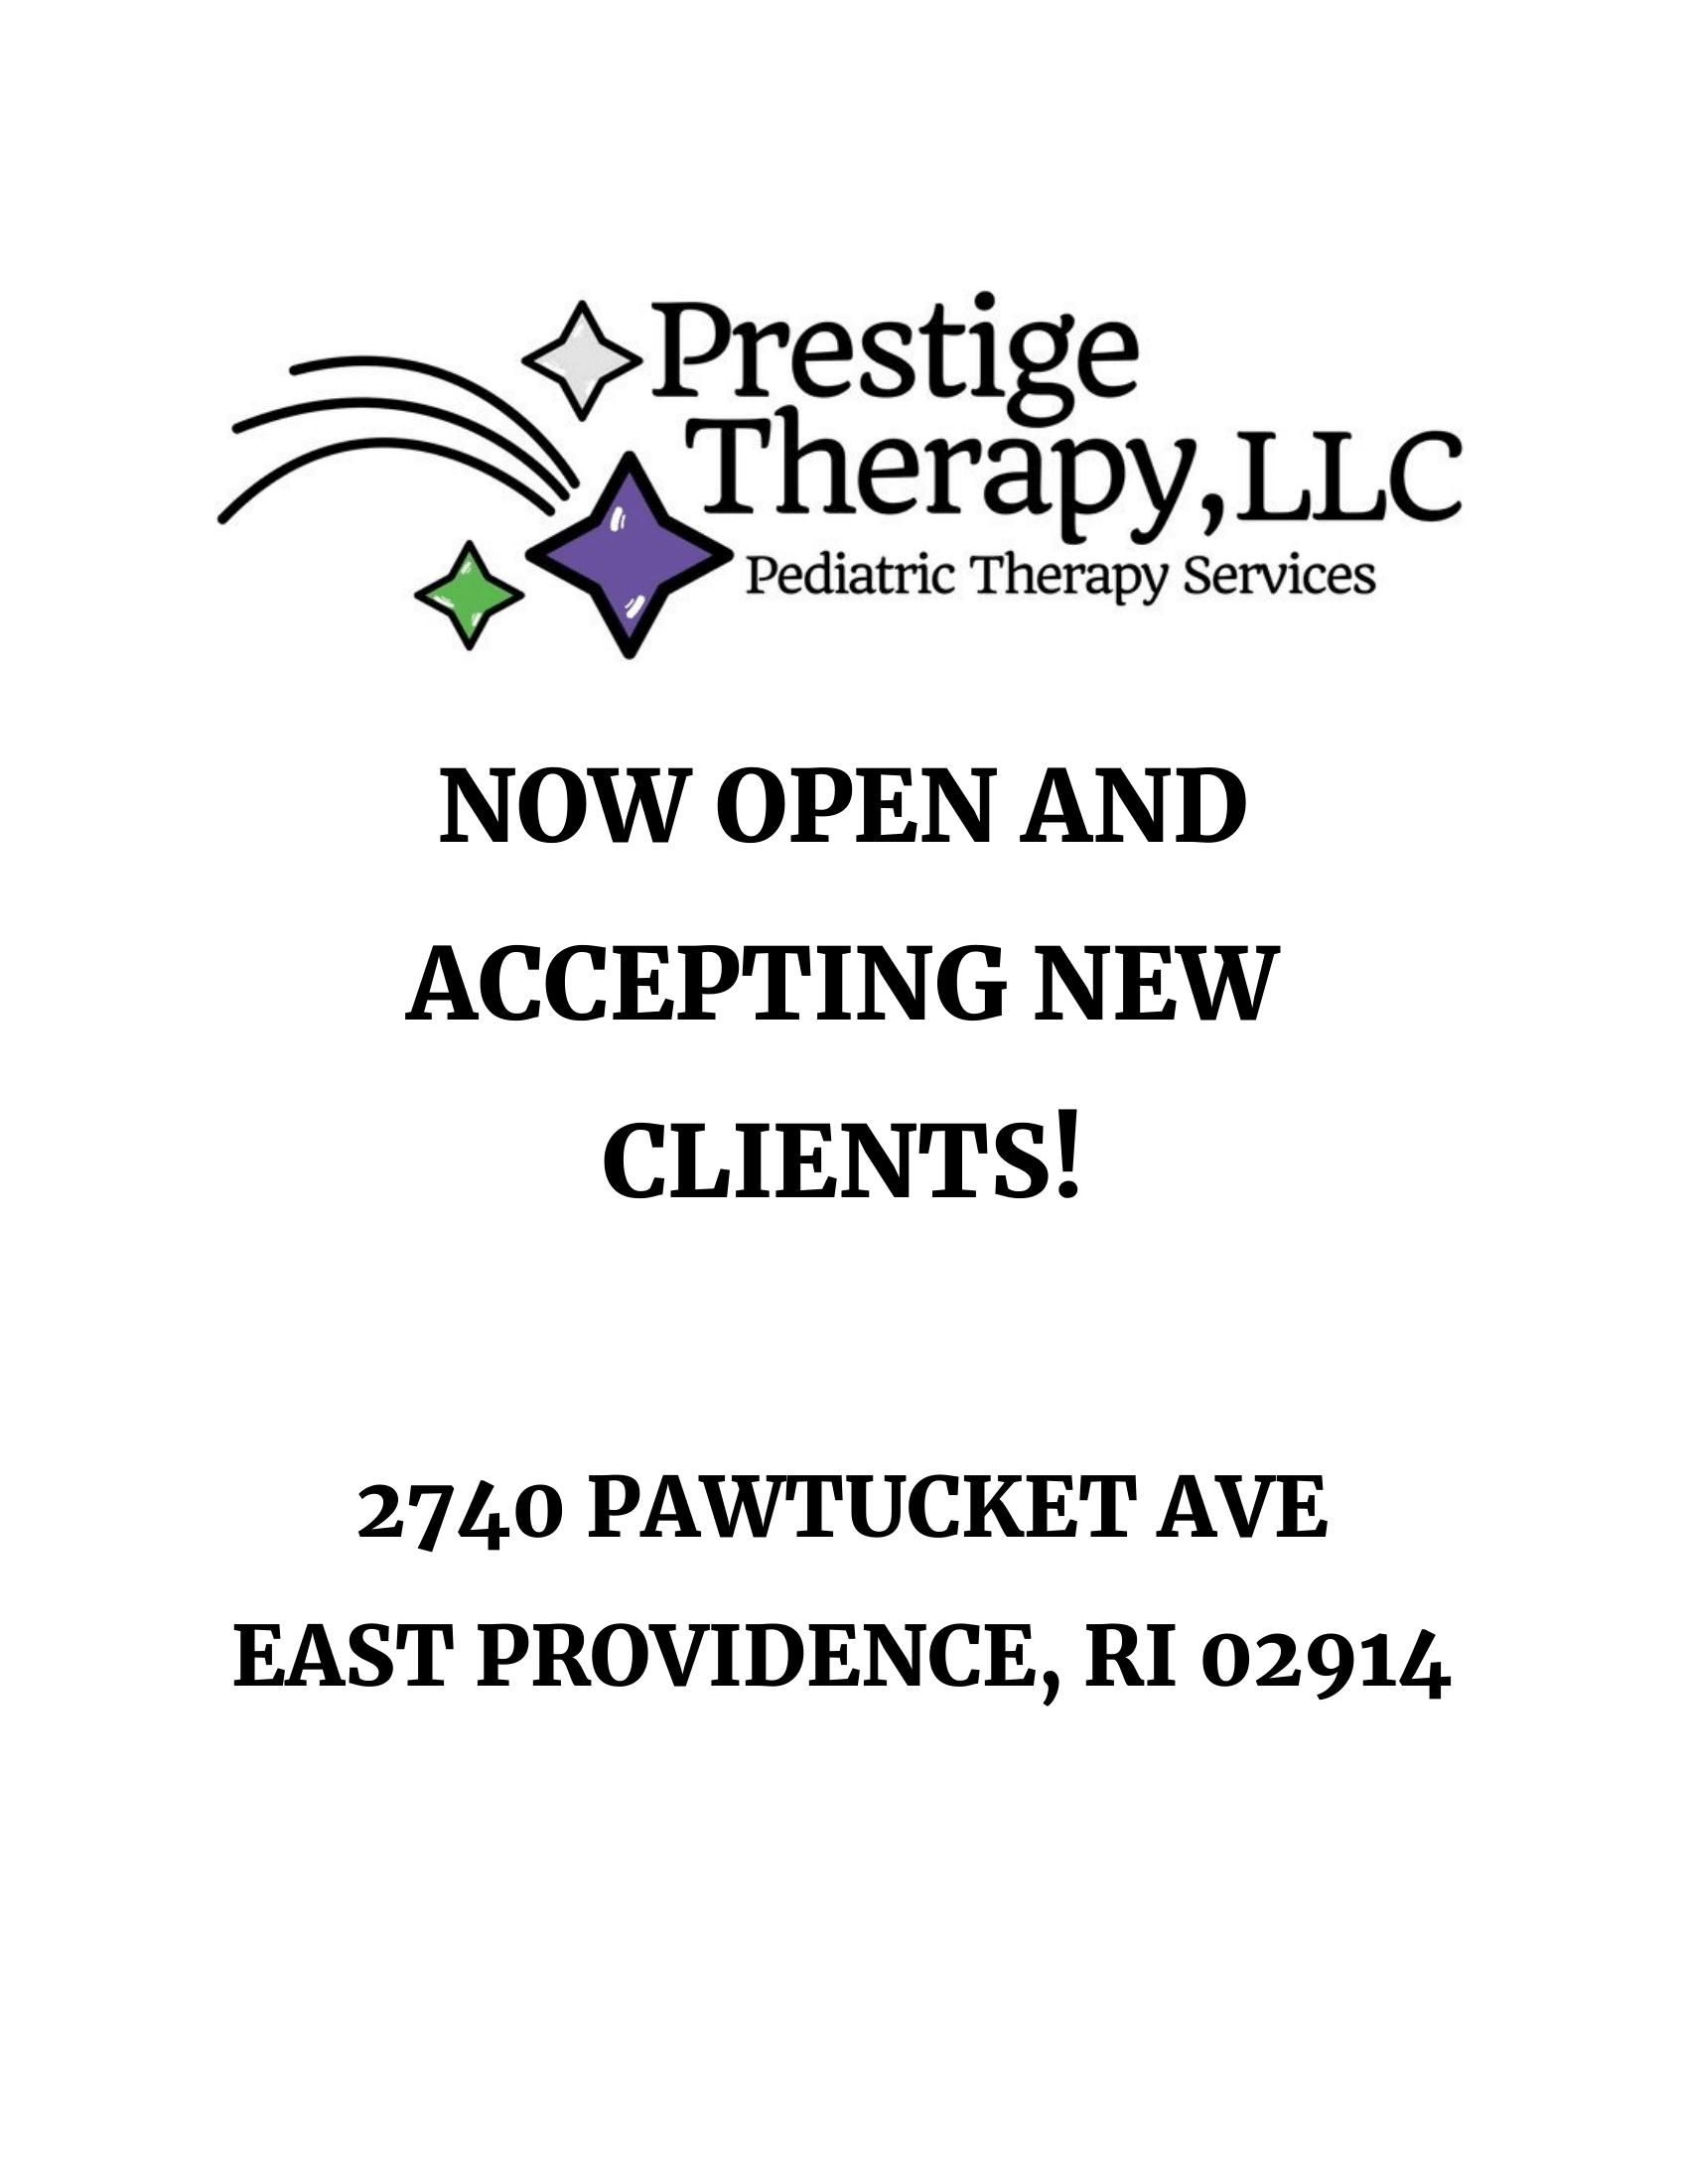 2740 Pawtucket Ave East Providence, RI 02914